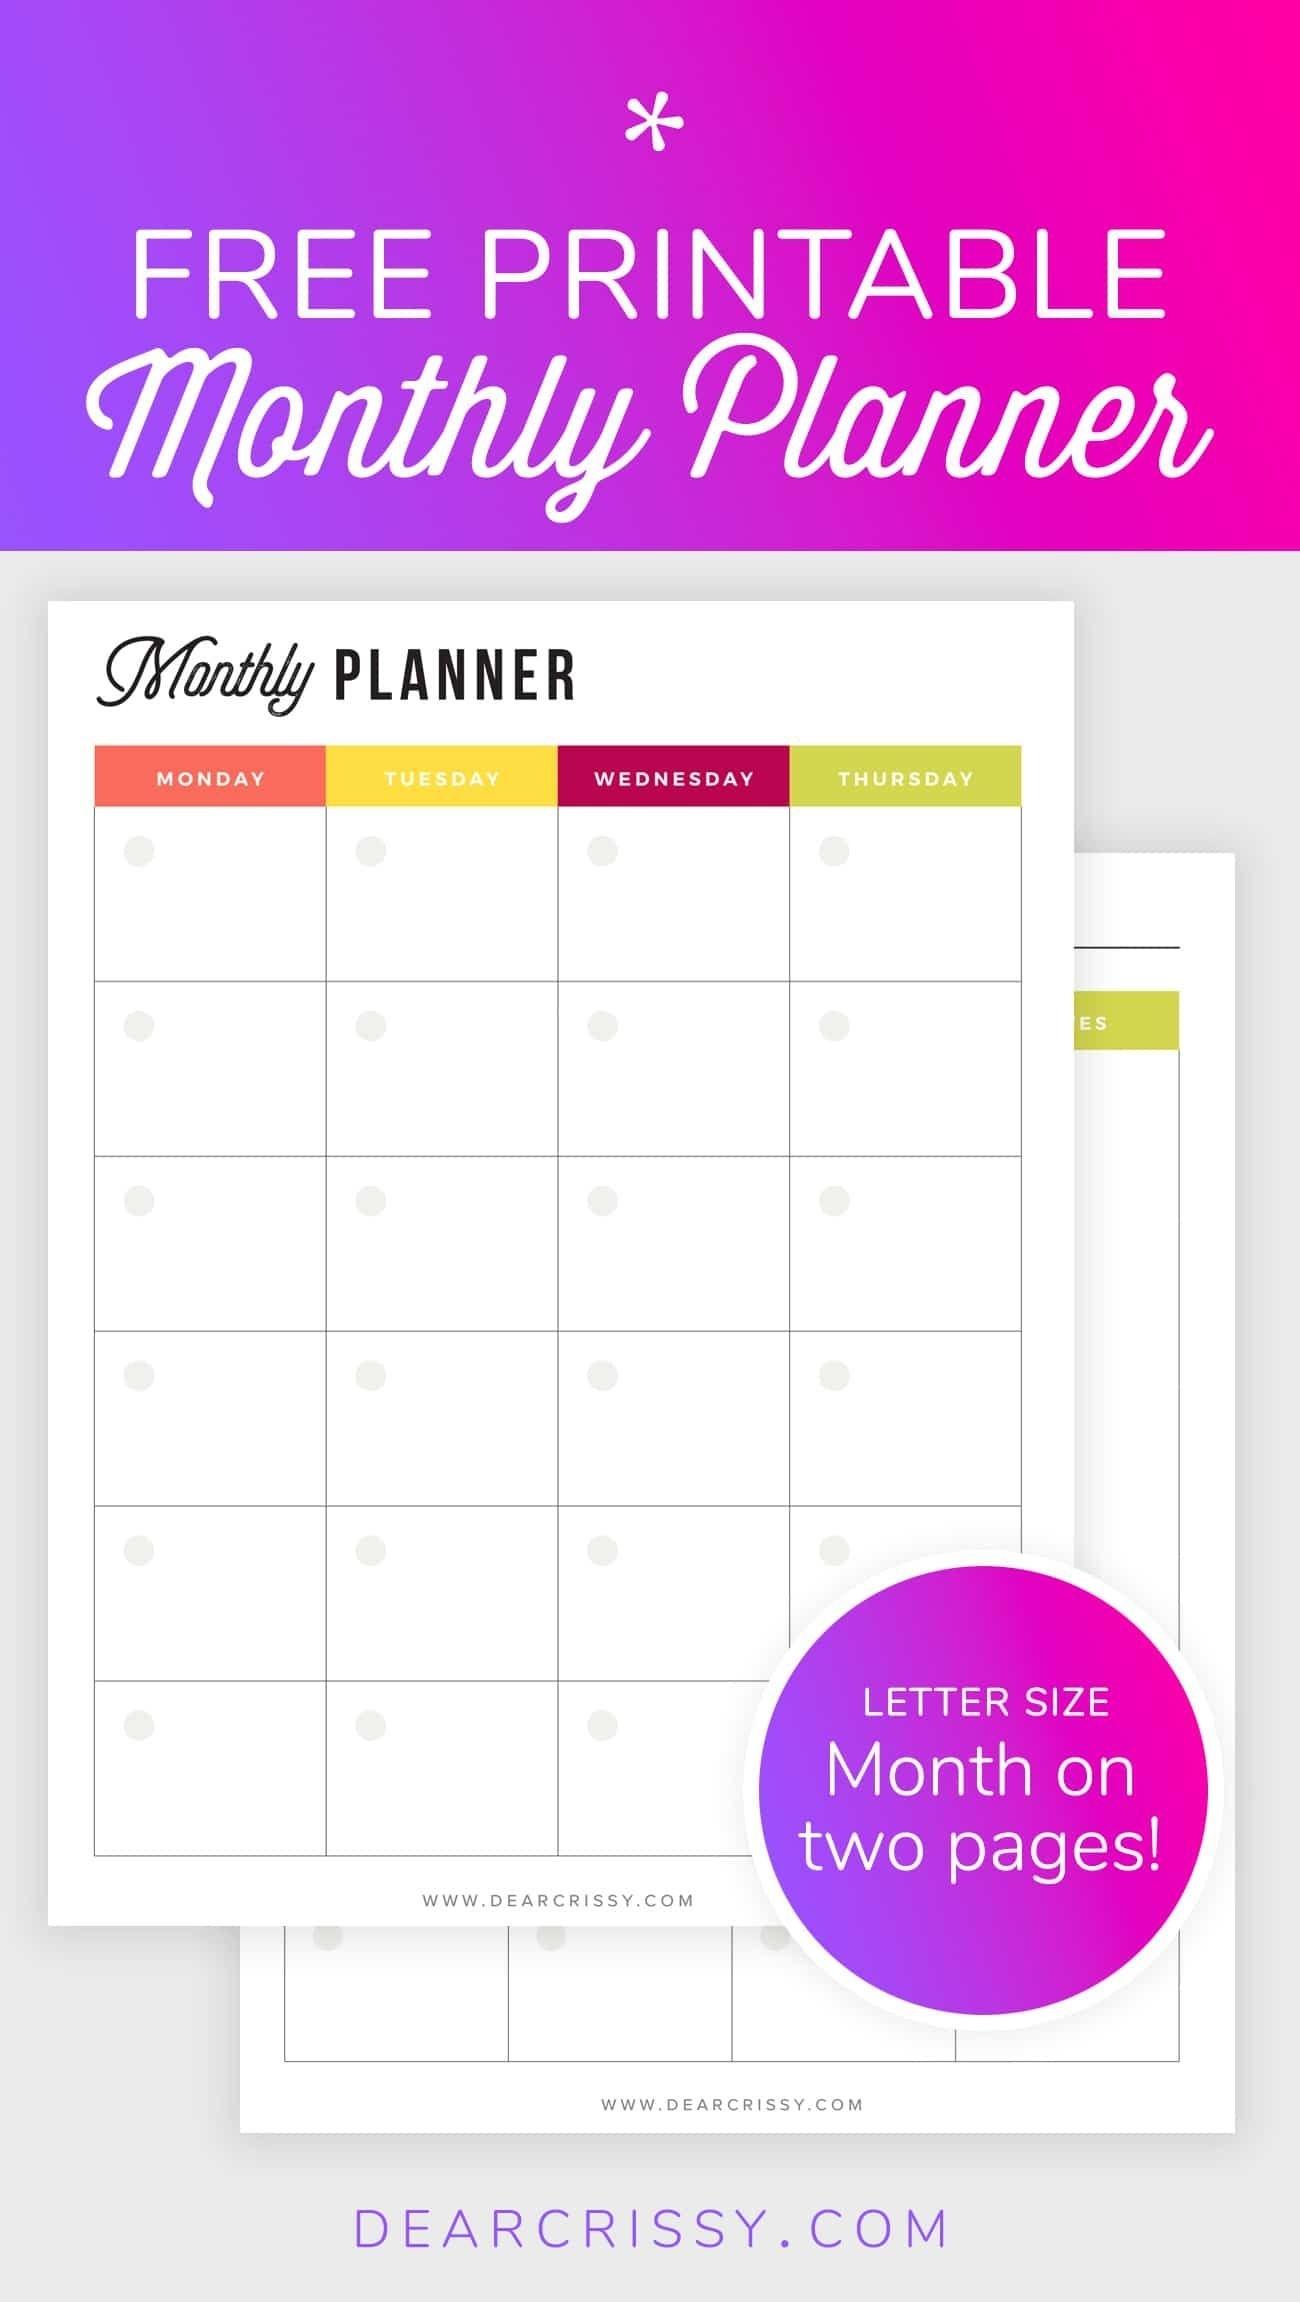 Free Printable Monthly Planner | Free Printable Planners | Free regarding Undated Printable Monthly Calendar Free